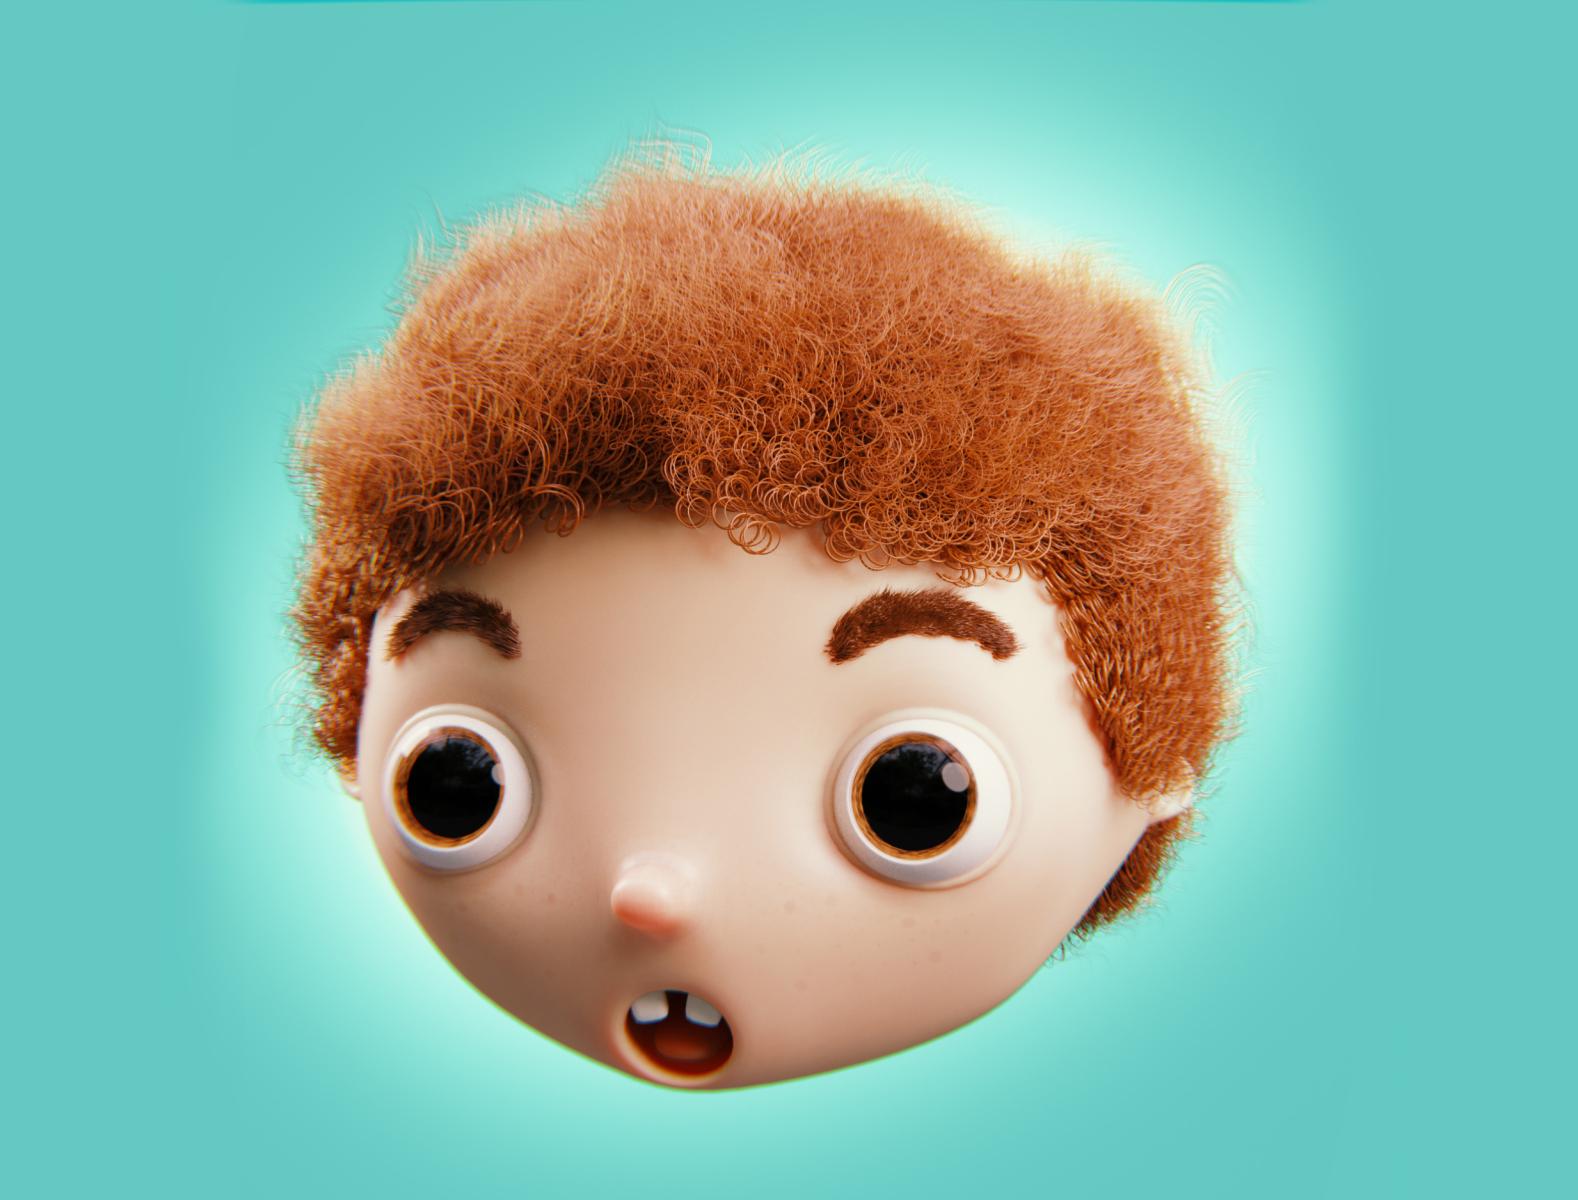 Little Redhead Boy By Daniel Molina On Dribbble